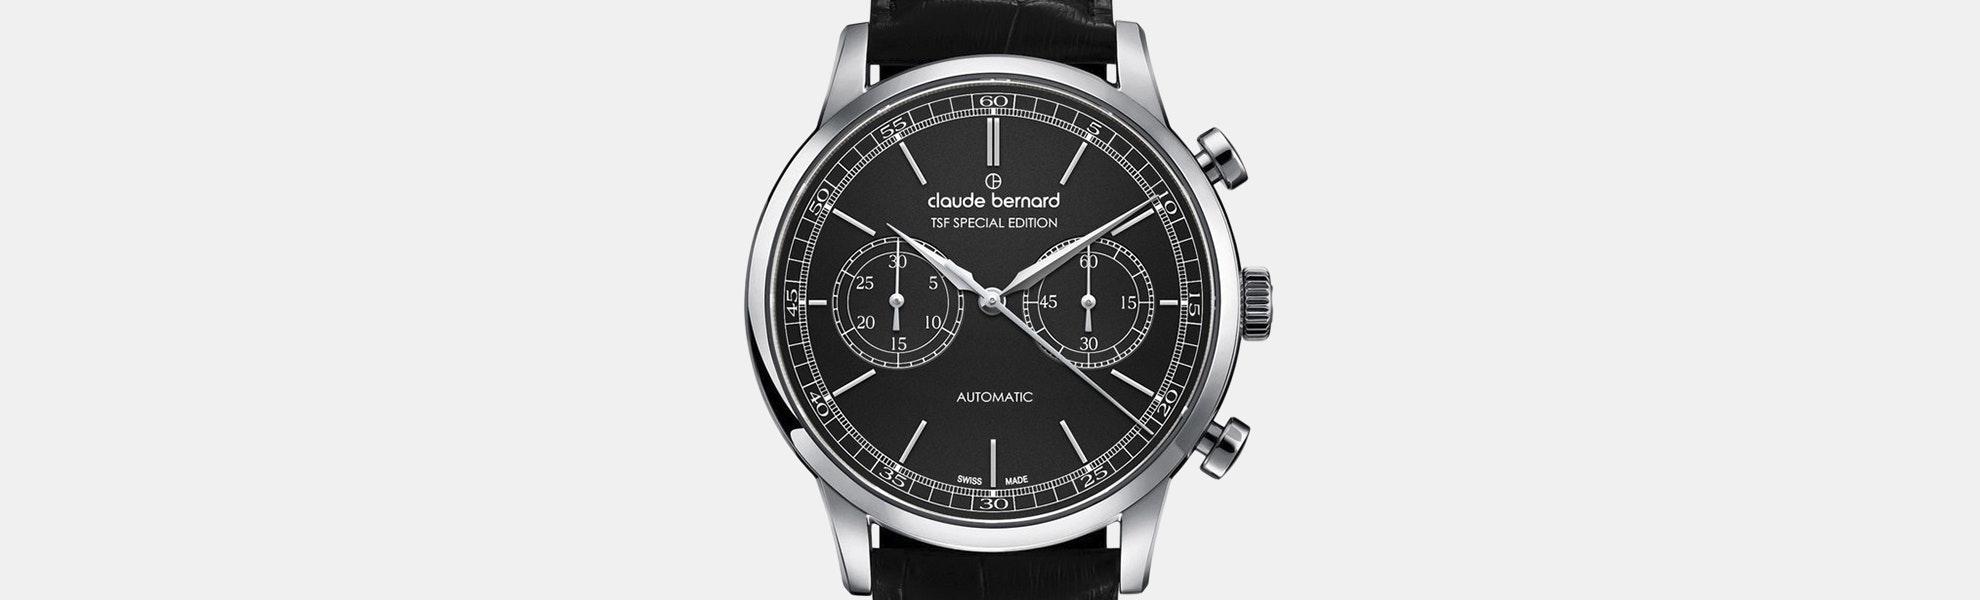 Claude Bernard By Edox Automatic Swiss Chronograph